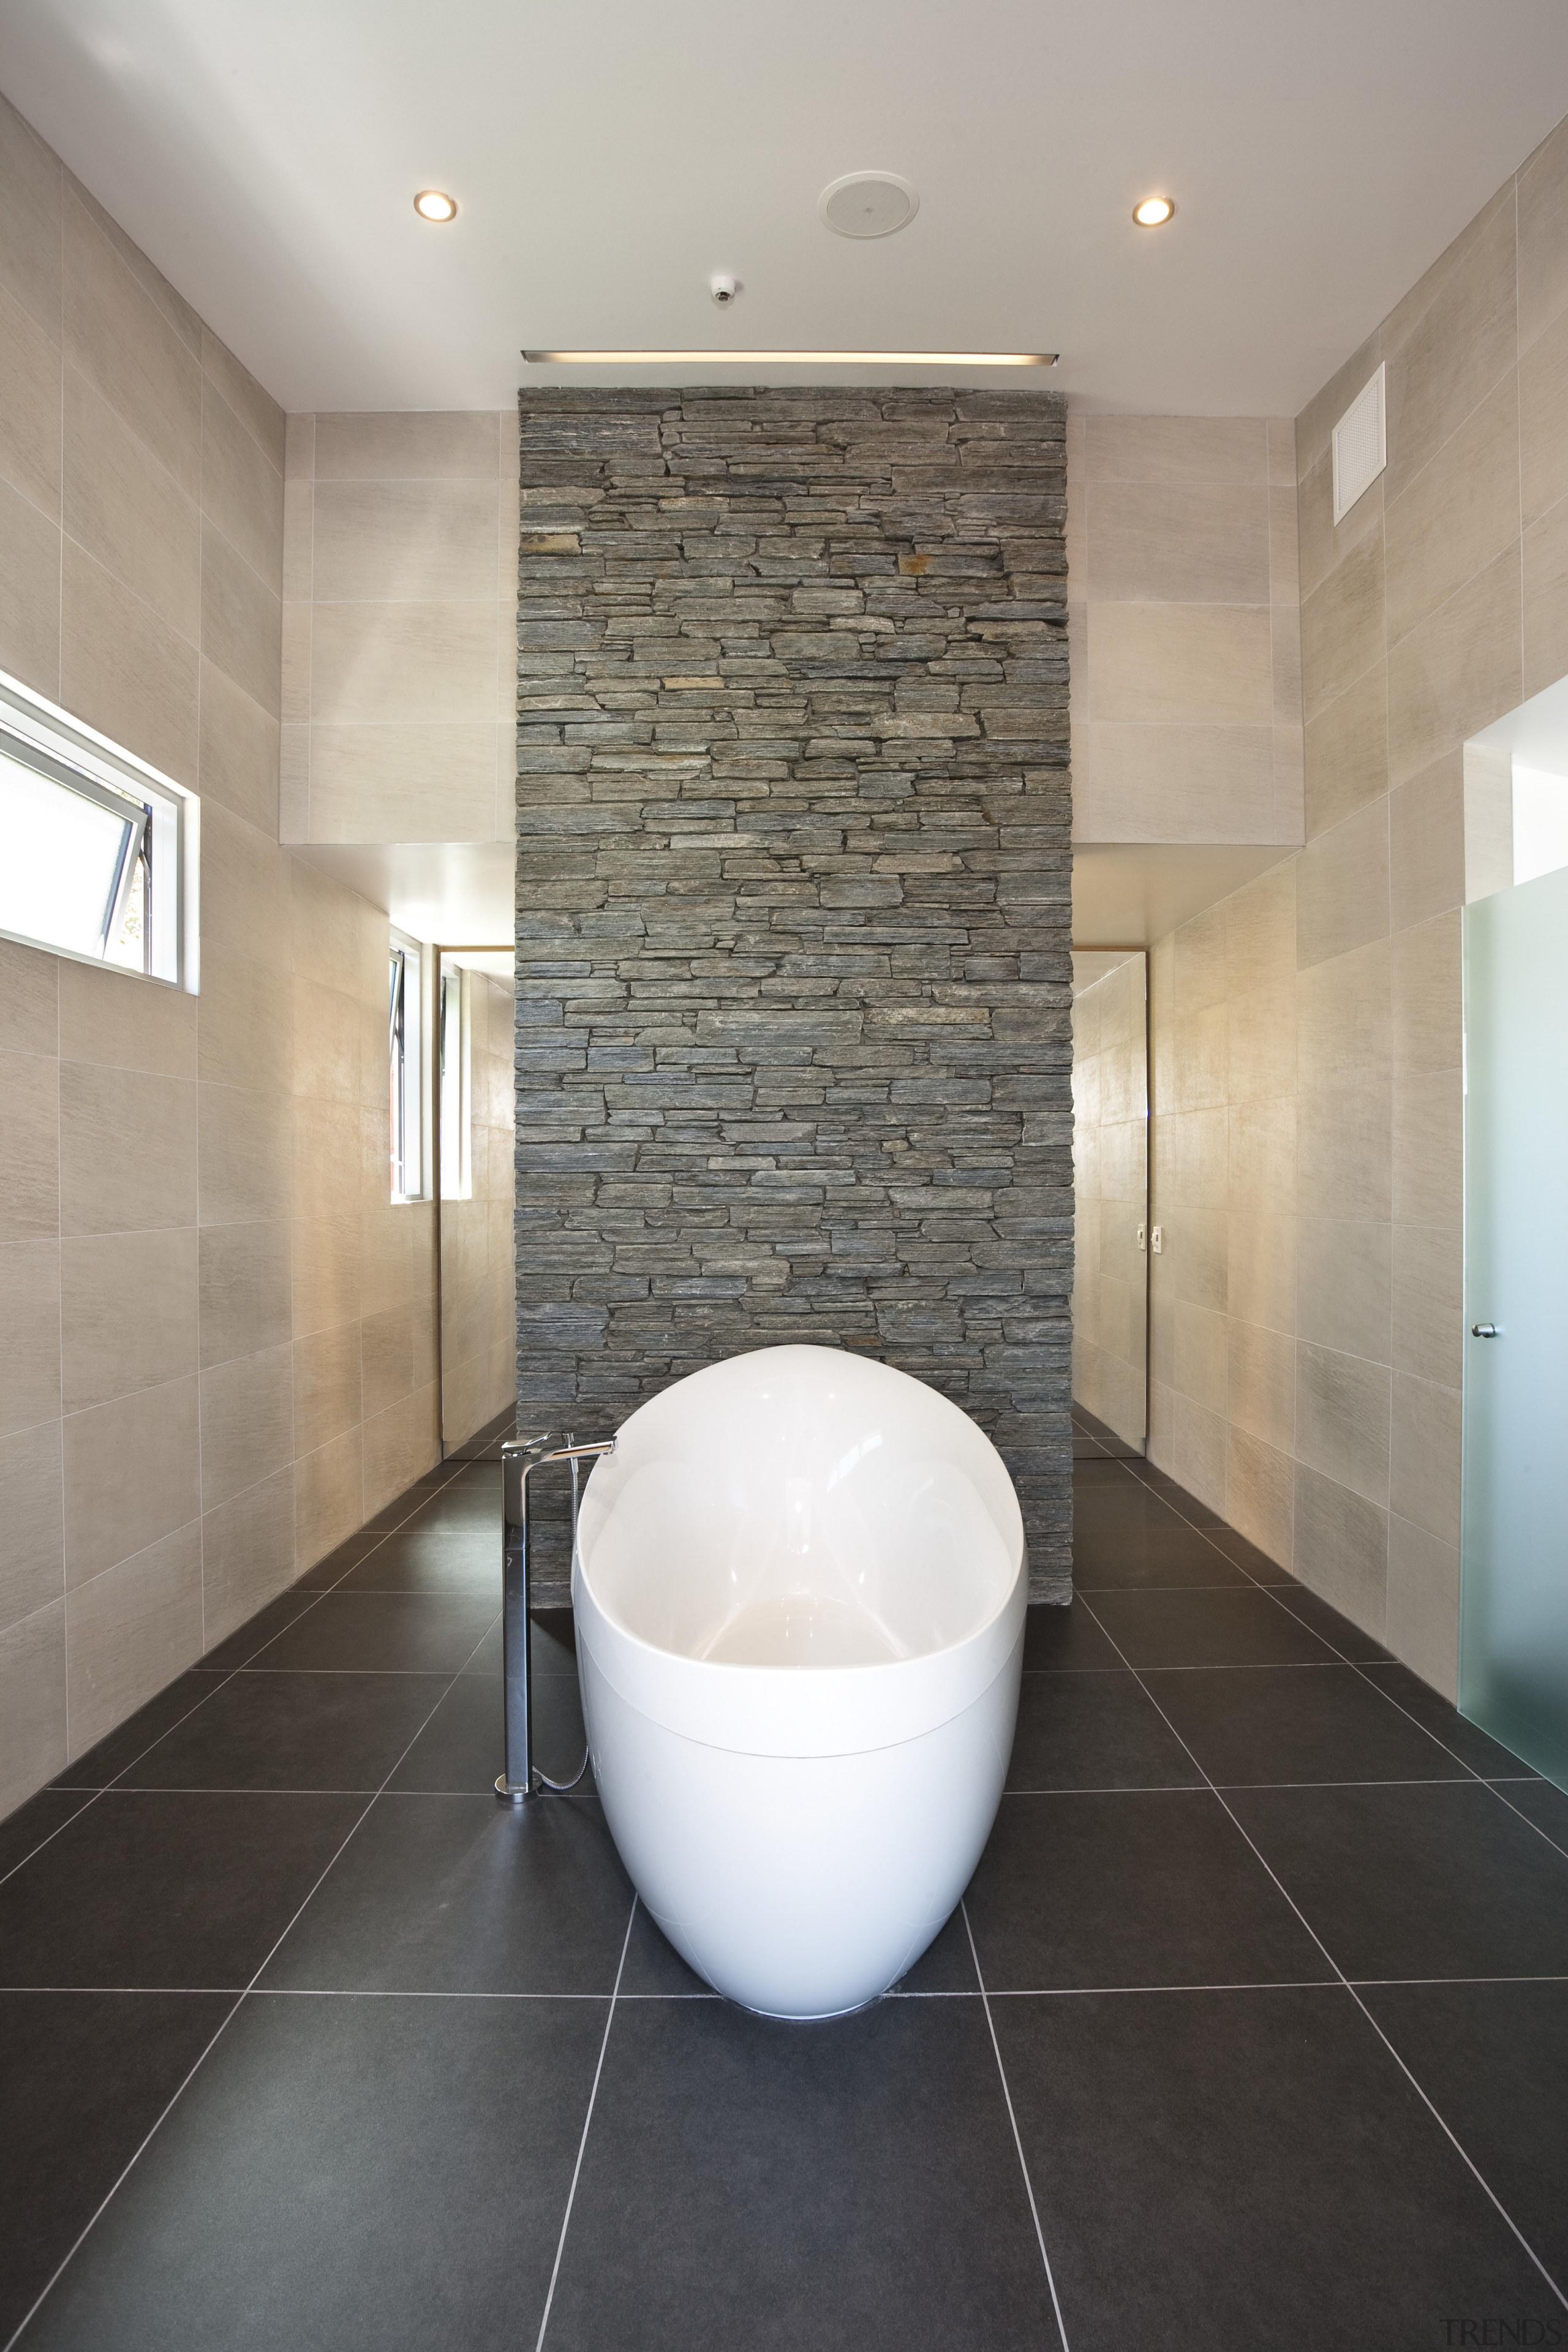 Interior view of this contemporary bathroom - Interior architecture, bathroom, ceiling, ceramic, daylighting, floor, flooring, interior design, plumbing fixture, room, sink, tile, wall, gray